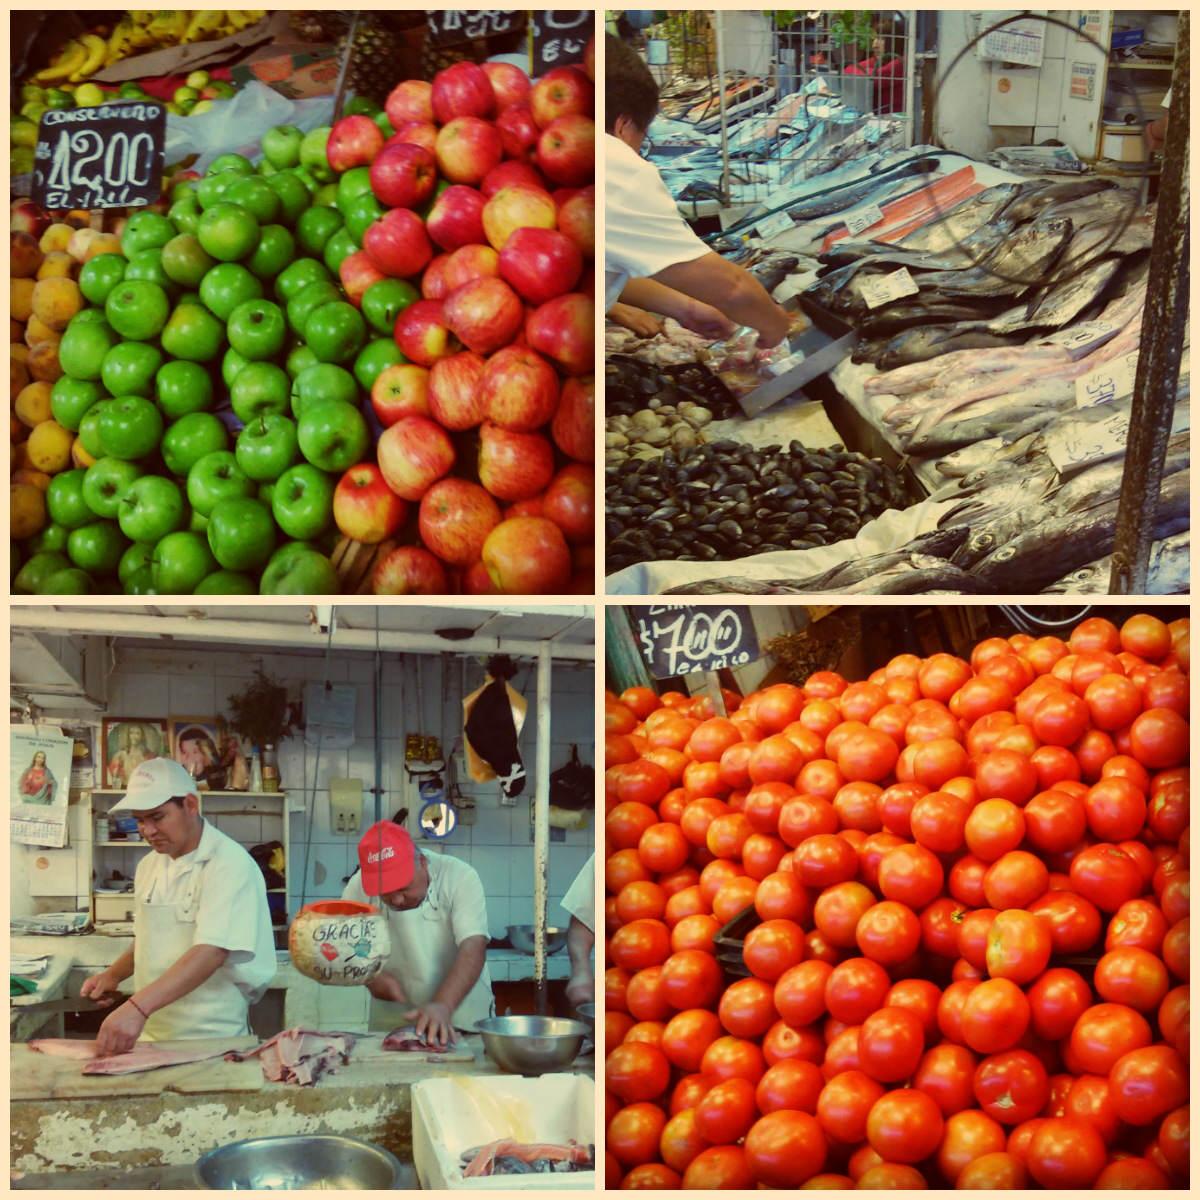 La Vega | Mercado Central